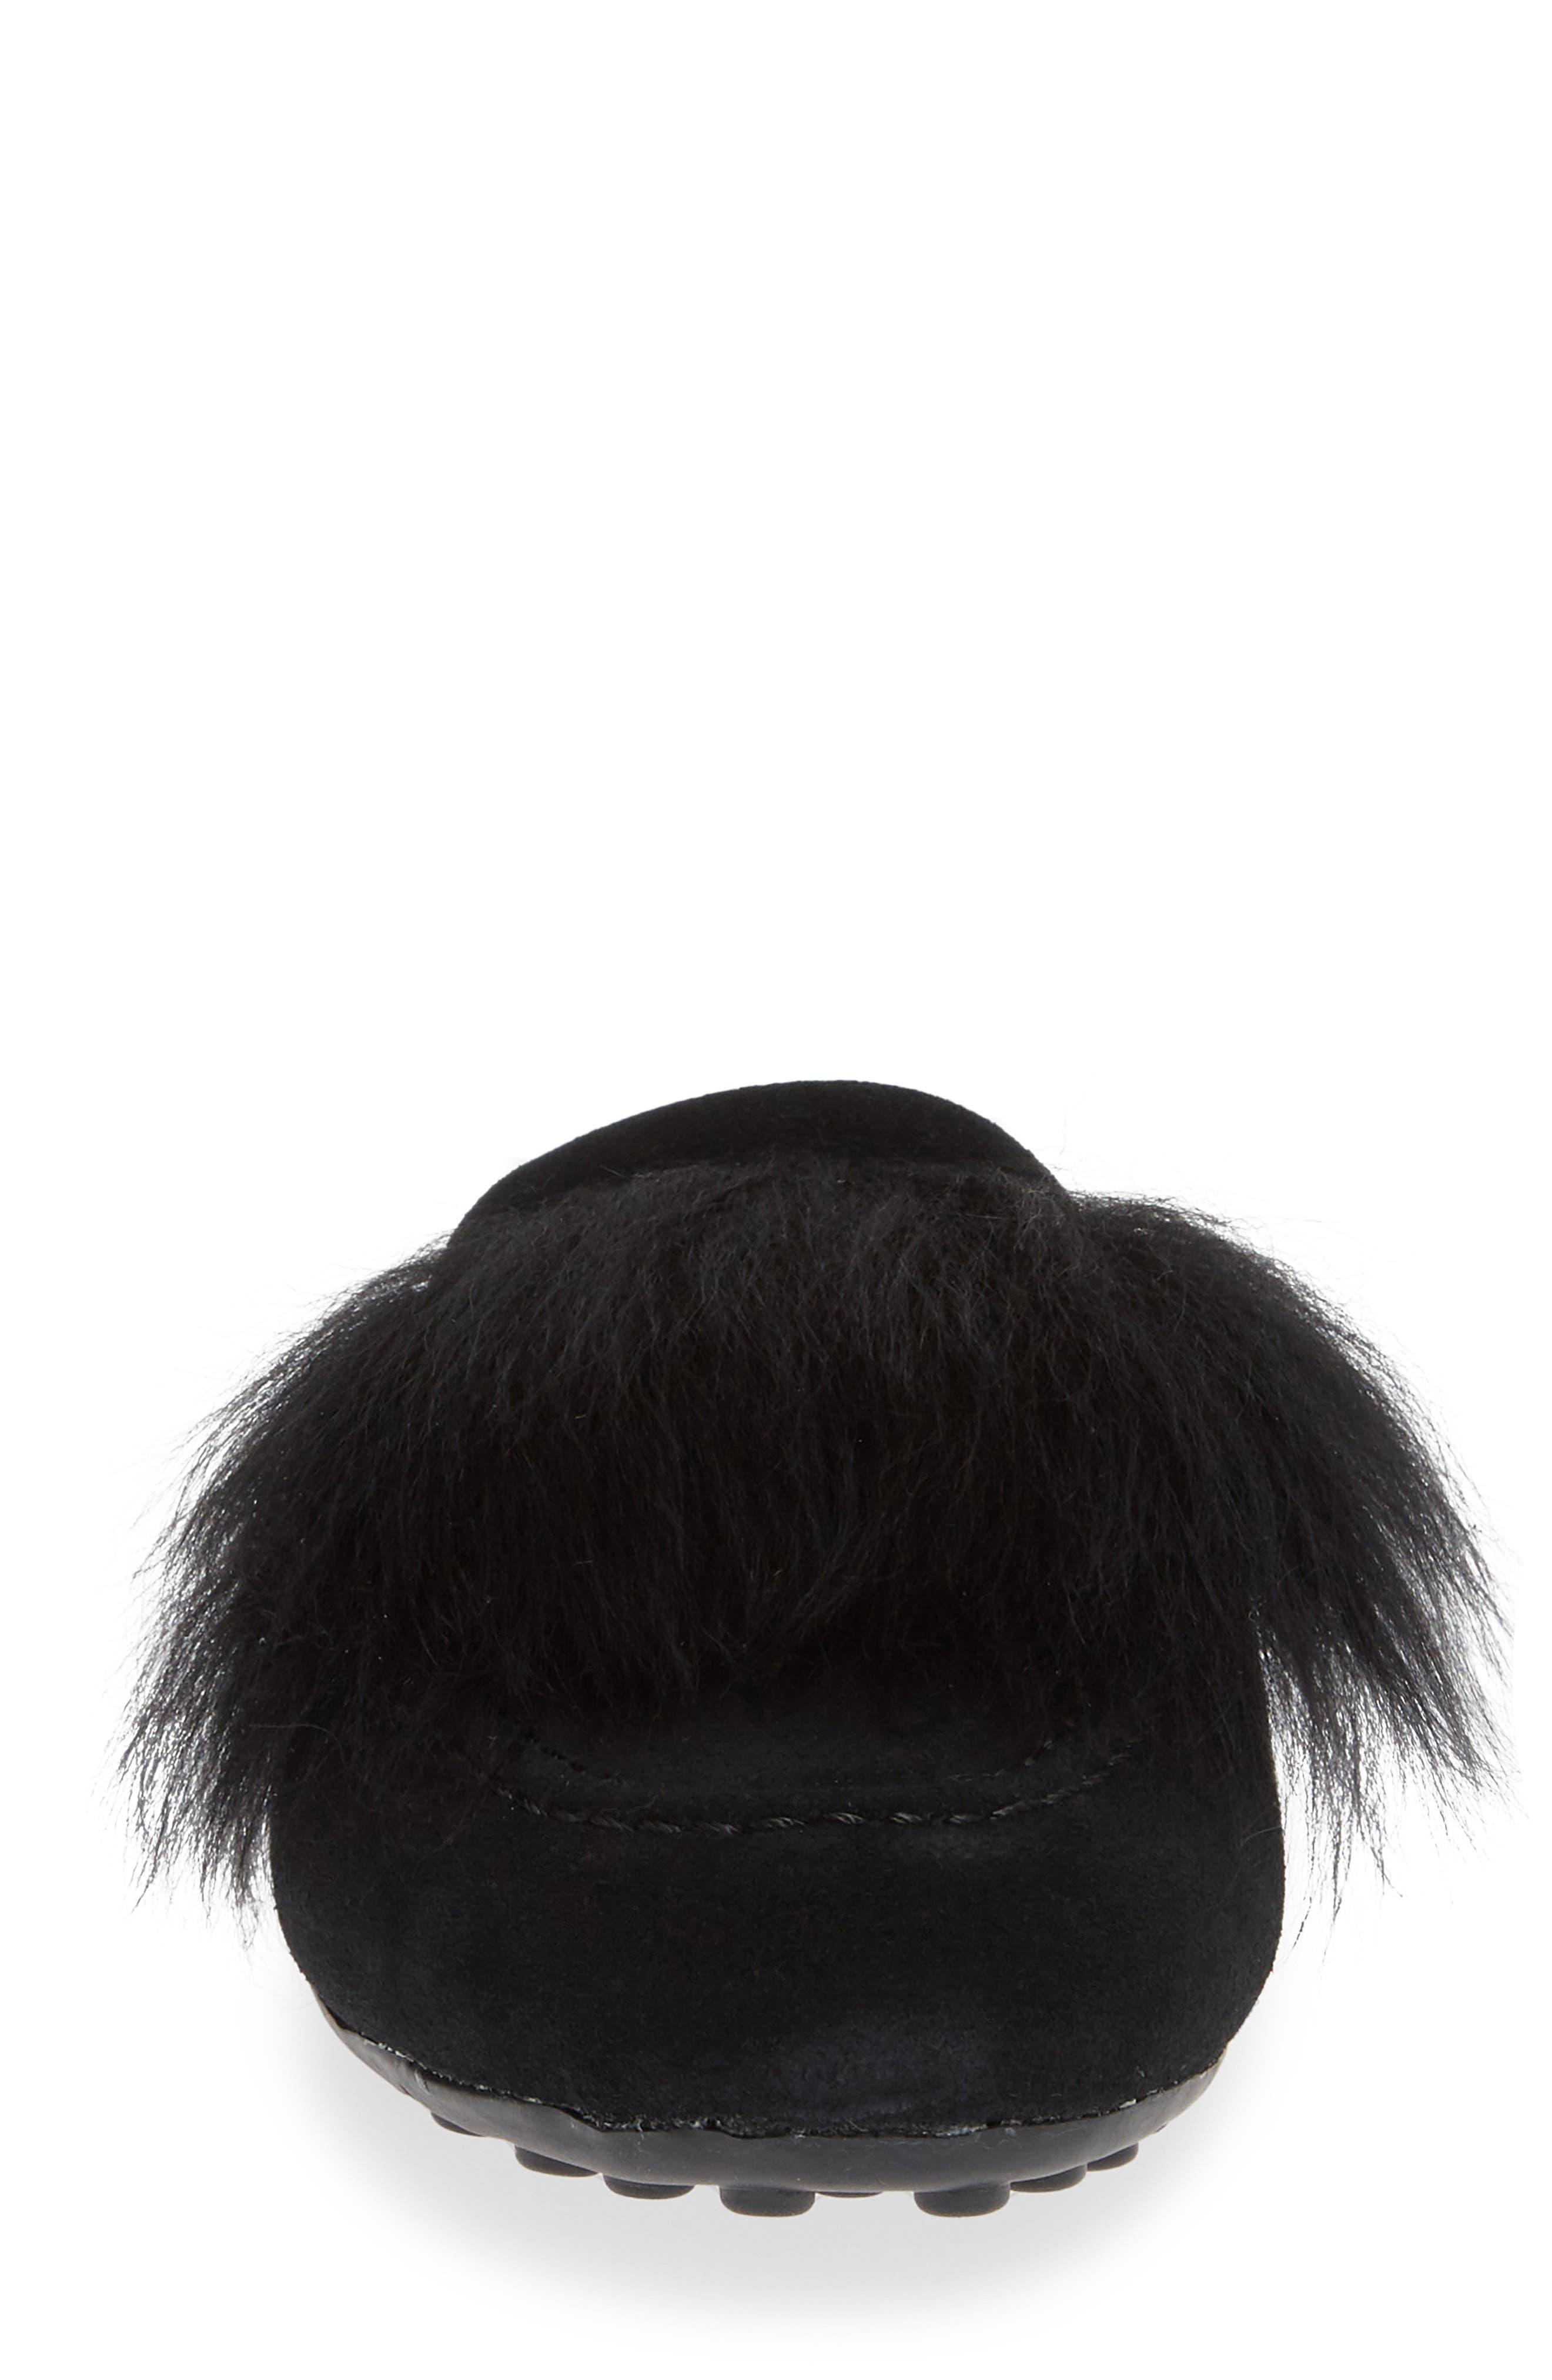 UGG<SUP>®</SUP>, Shaine Wisp Genuine Shearling Slipper, Alternate thumbnail 4, color, BLACK